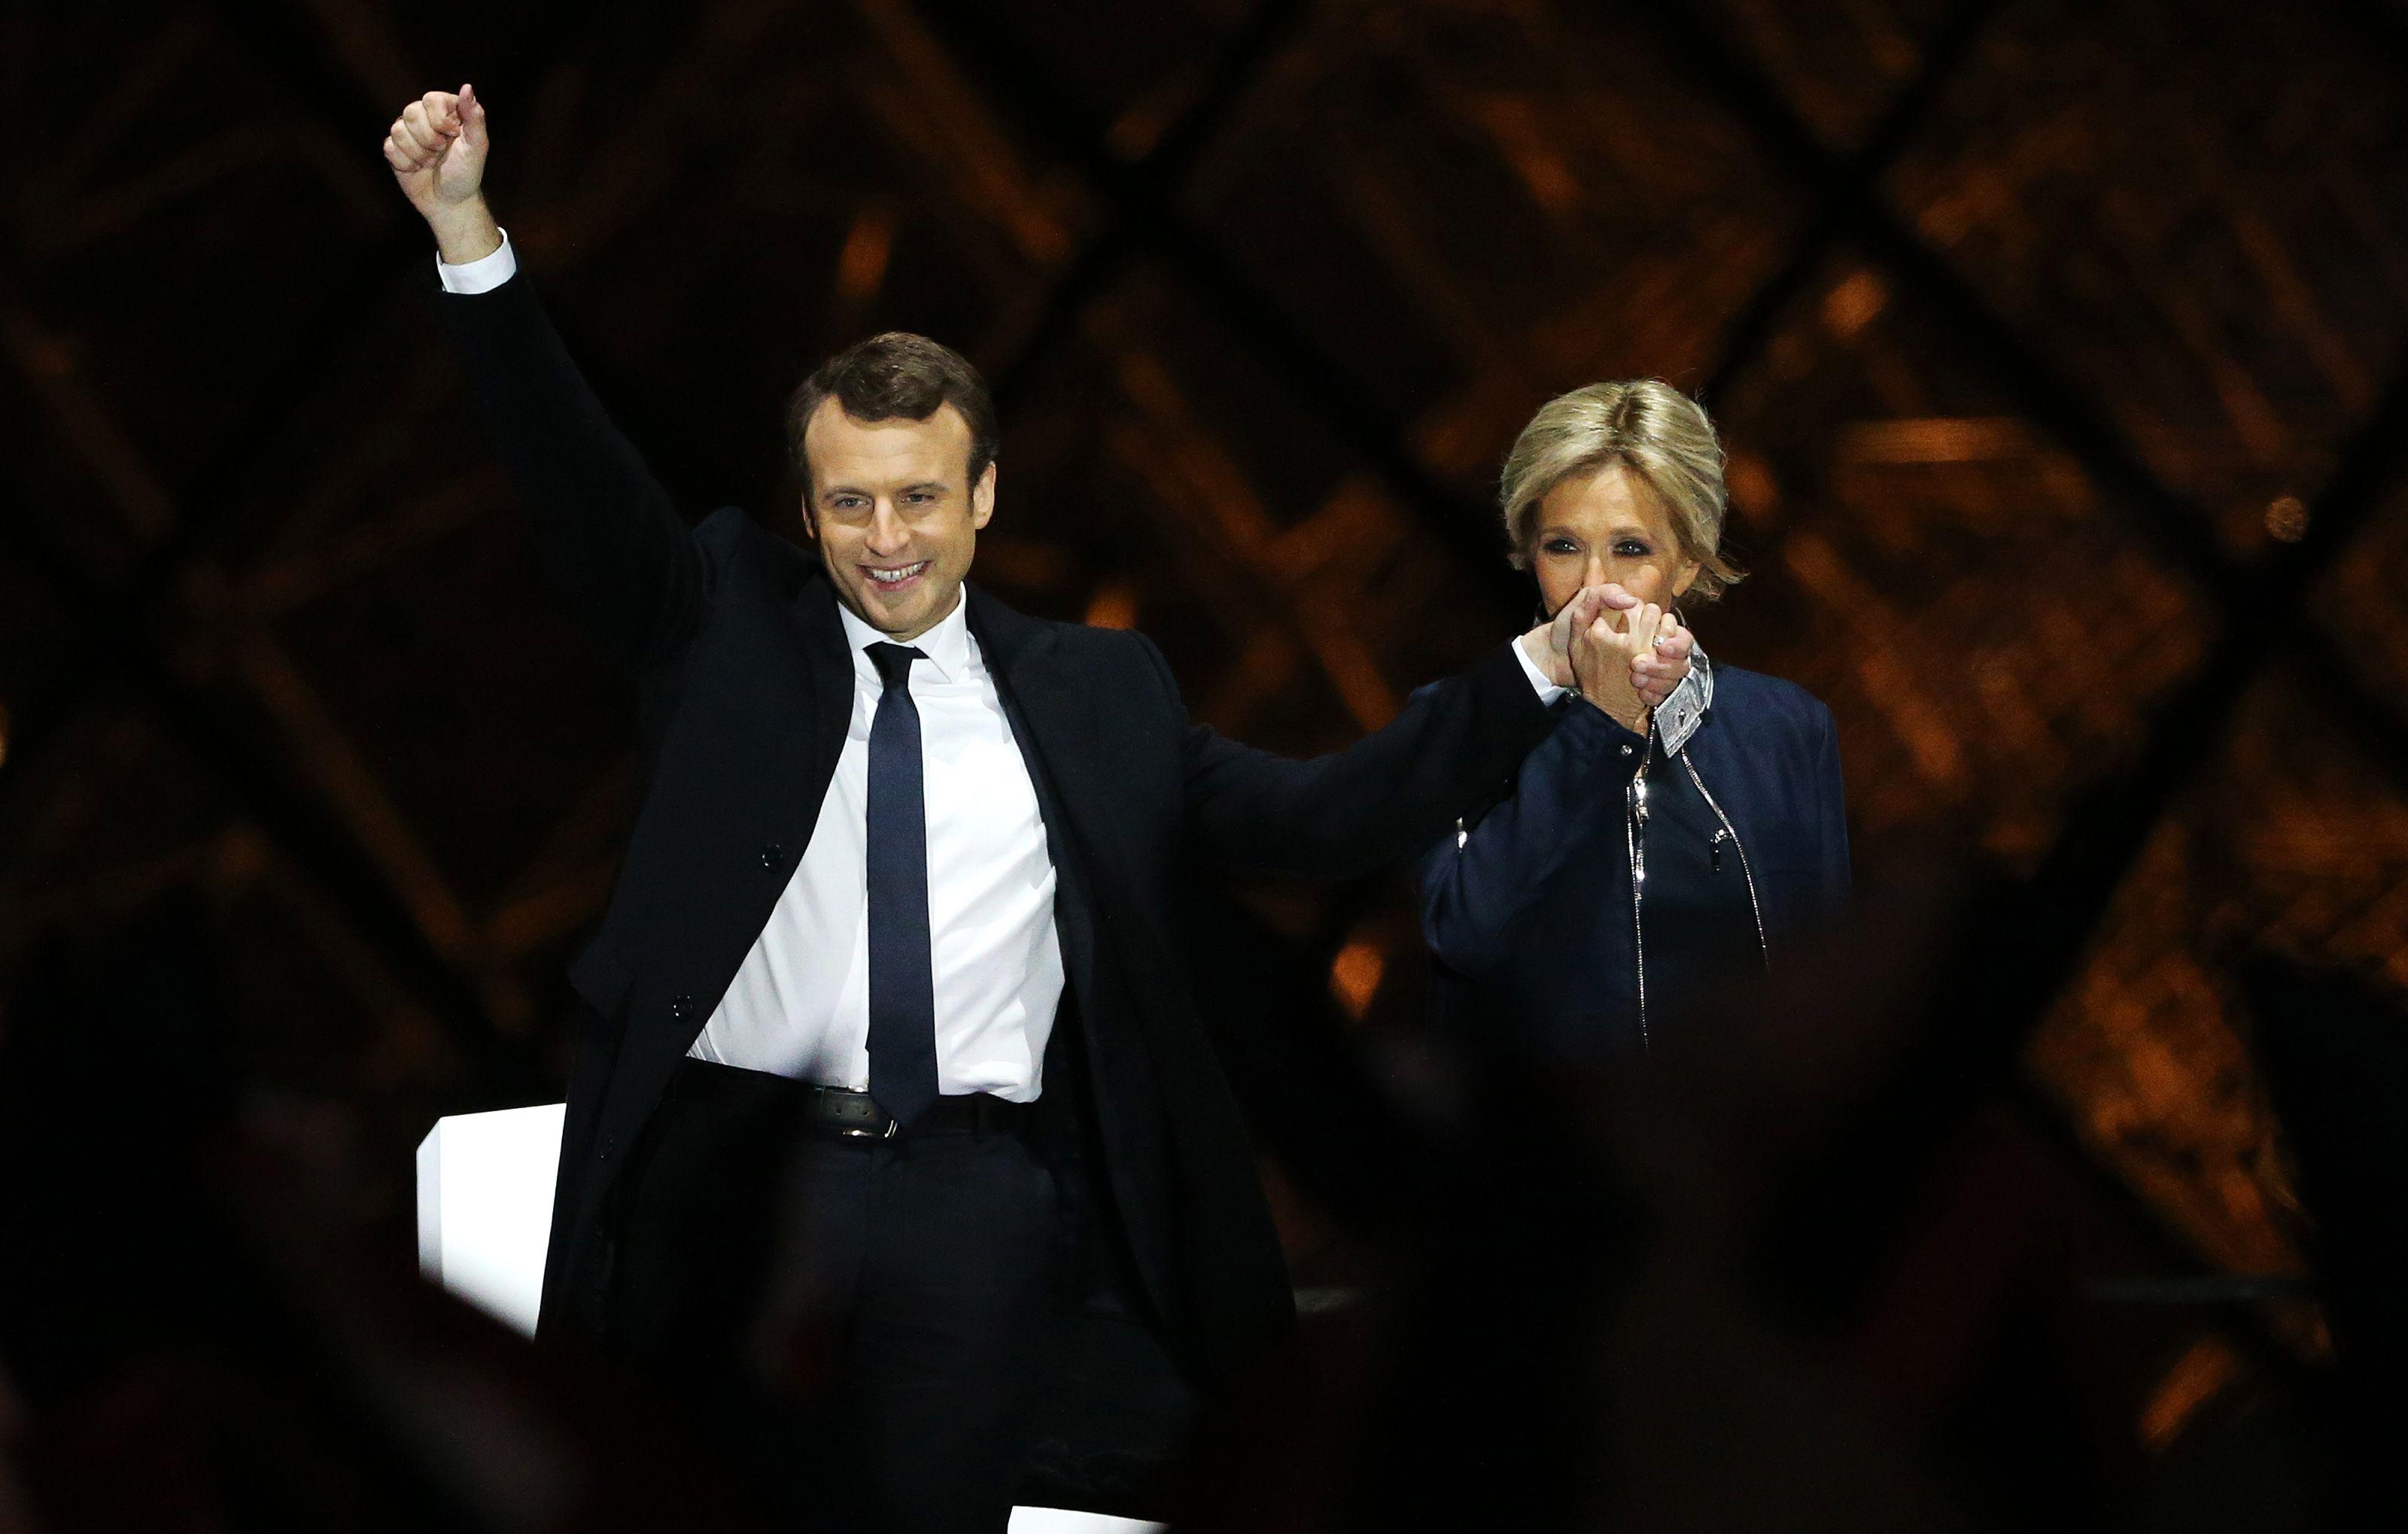 Emmanuel Macron Wedding.Emmanuel And Brigitte Macron Photos Emmanuel Macron And Brigitte